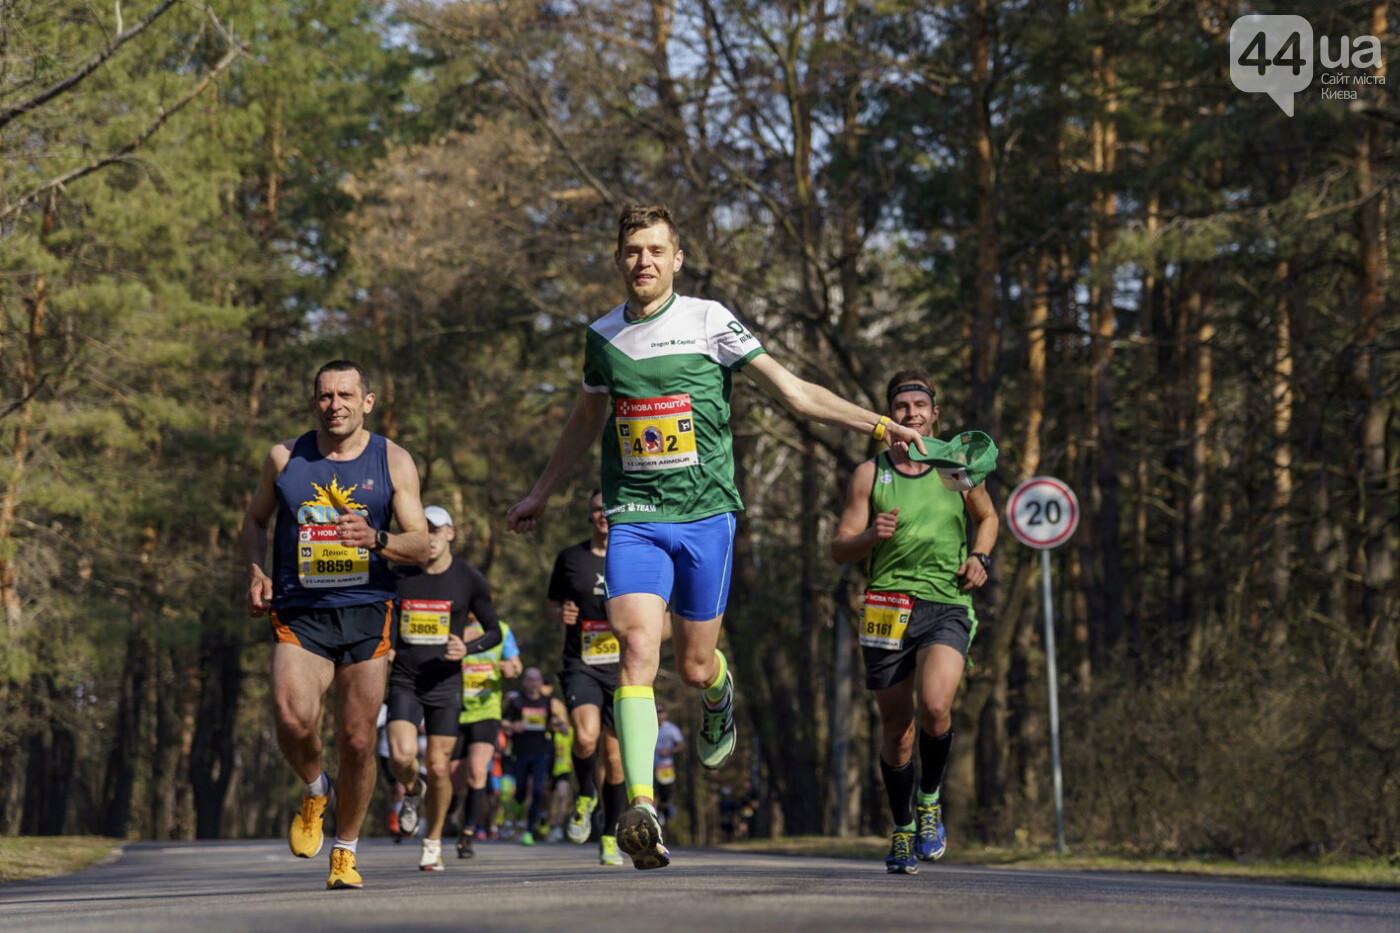 9th Nova Poshta Kyiv Half Marathon собрал рекордное количество бегунов из 57 стран мира, фото-1